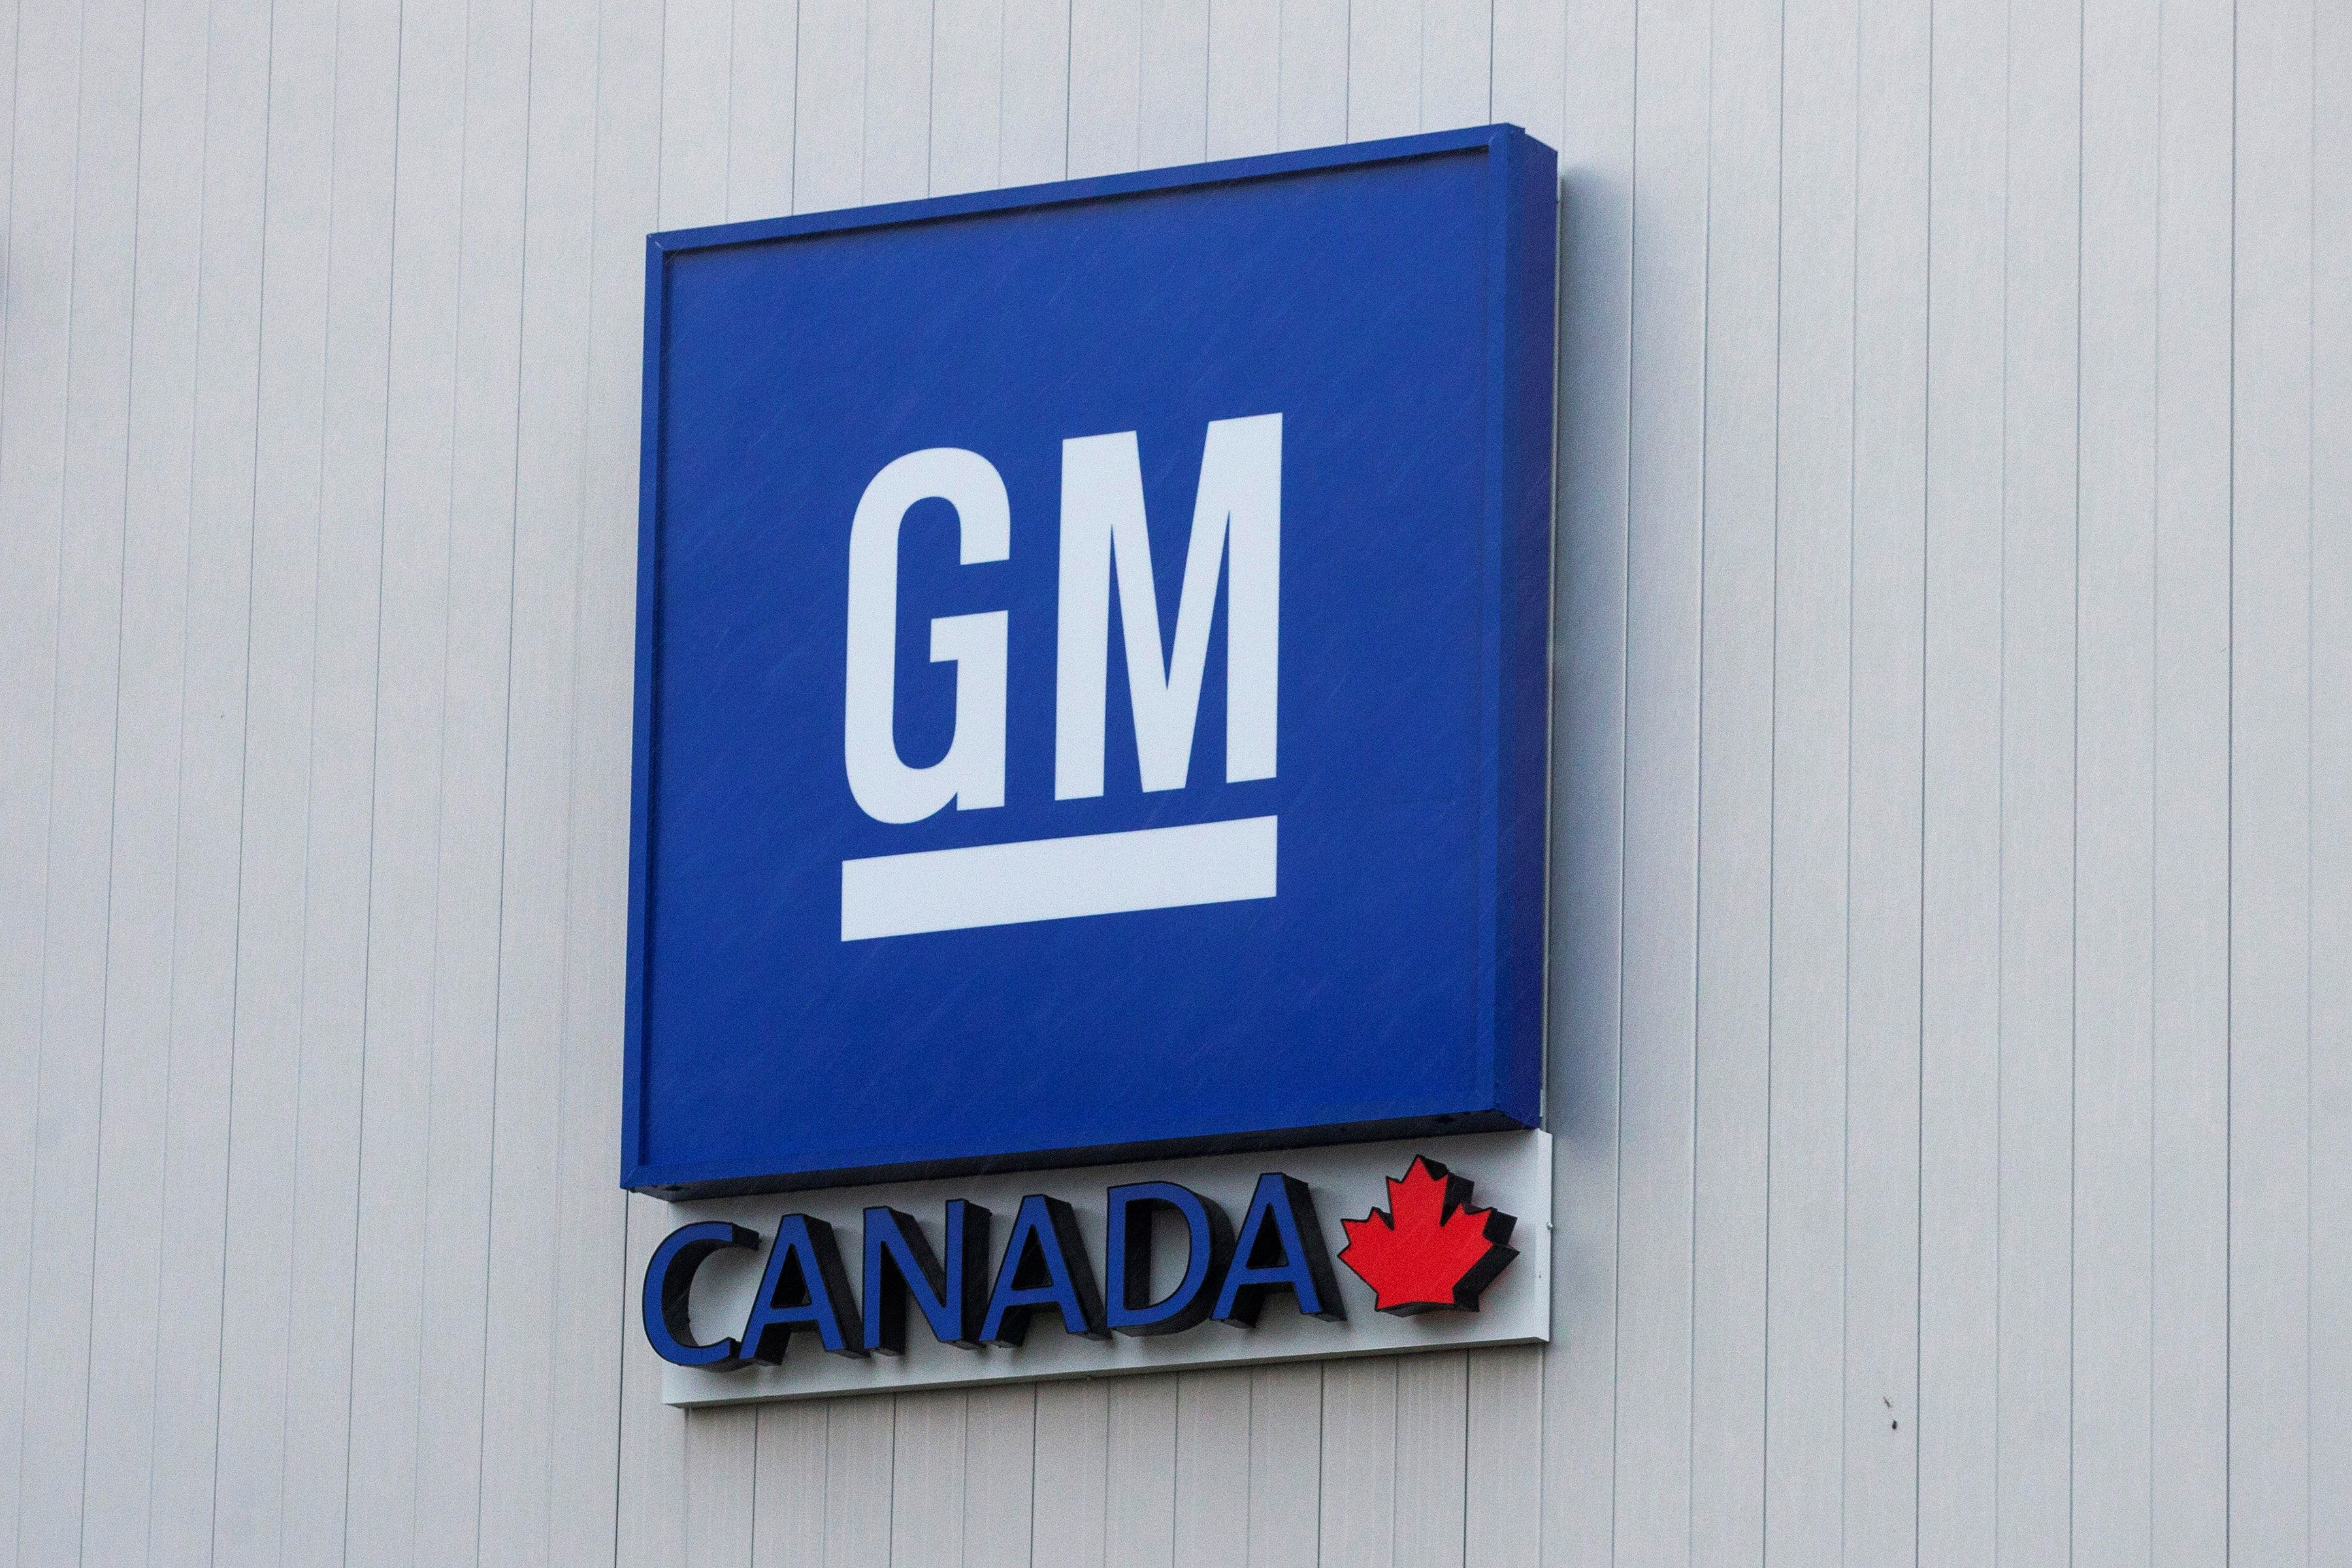 The General Motors assembly plant in Oshawa, Ontario, Canada November 26, 2018. REUTERS/Carlos Osorio